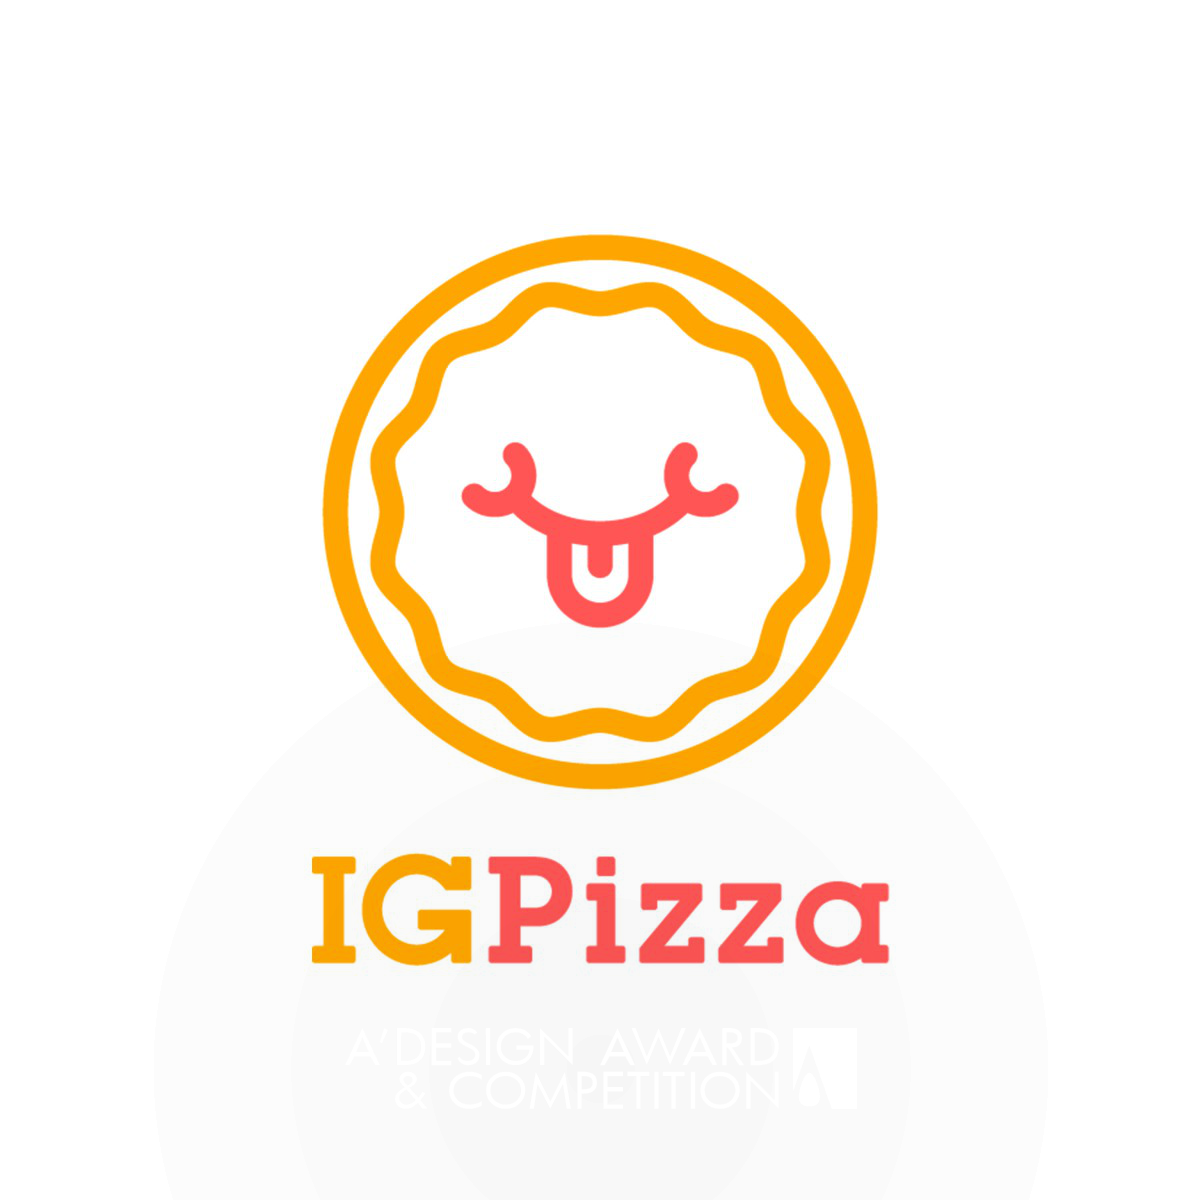 IGPizza Corporate Identity